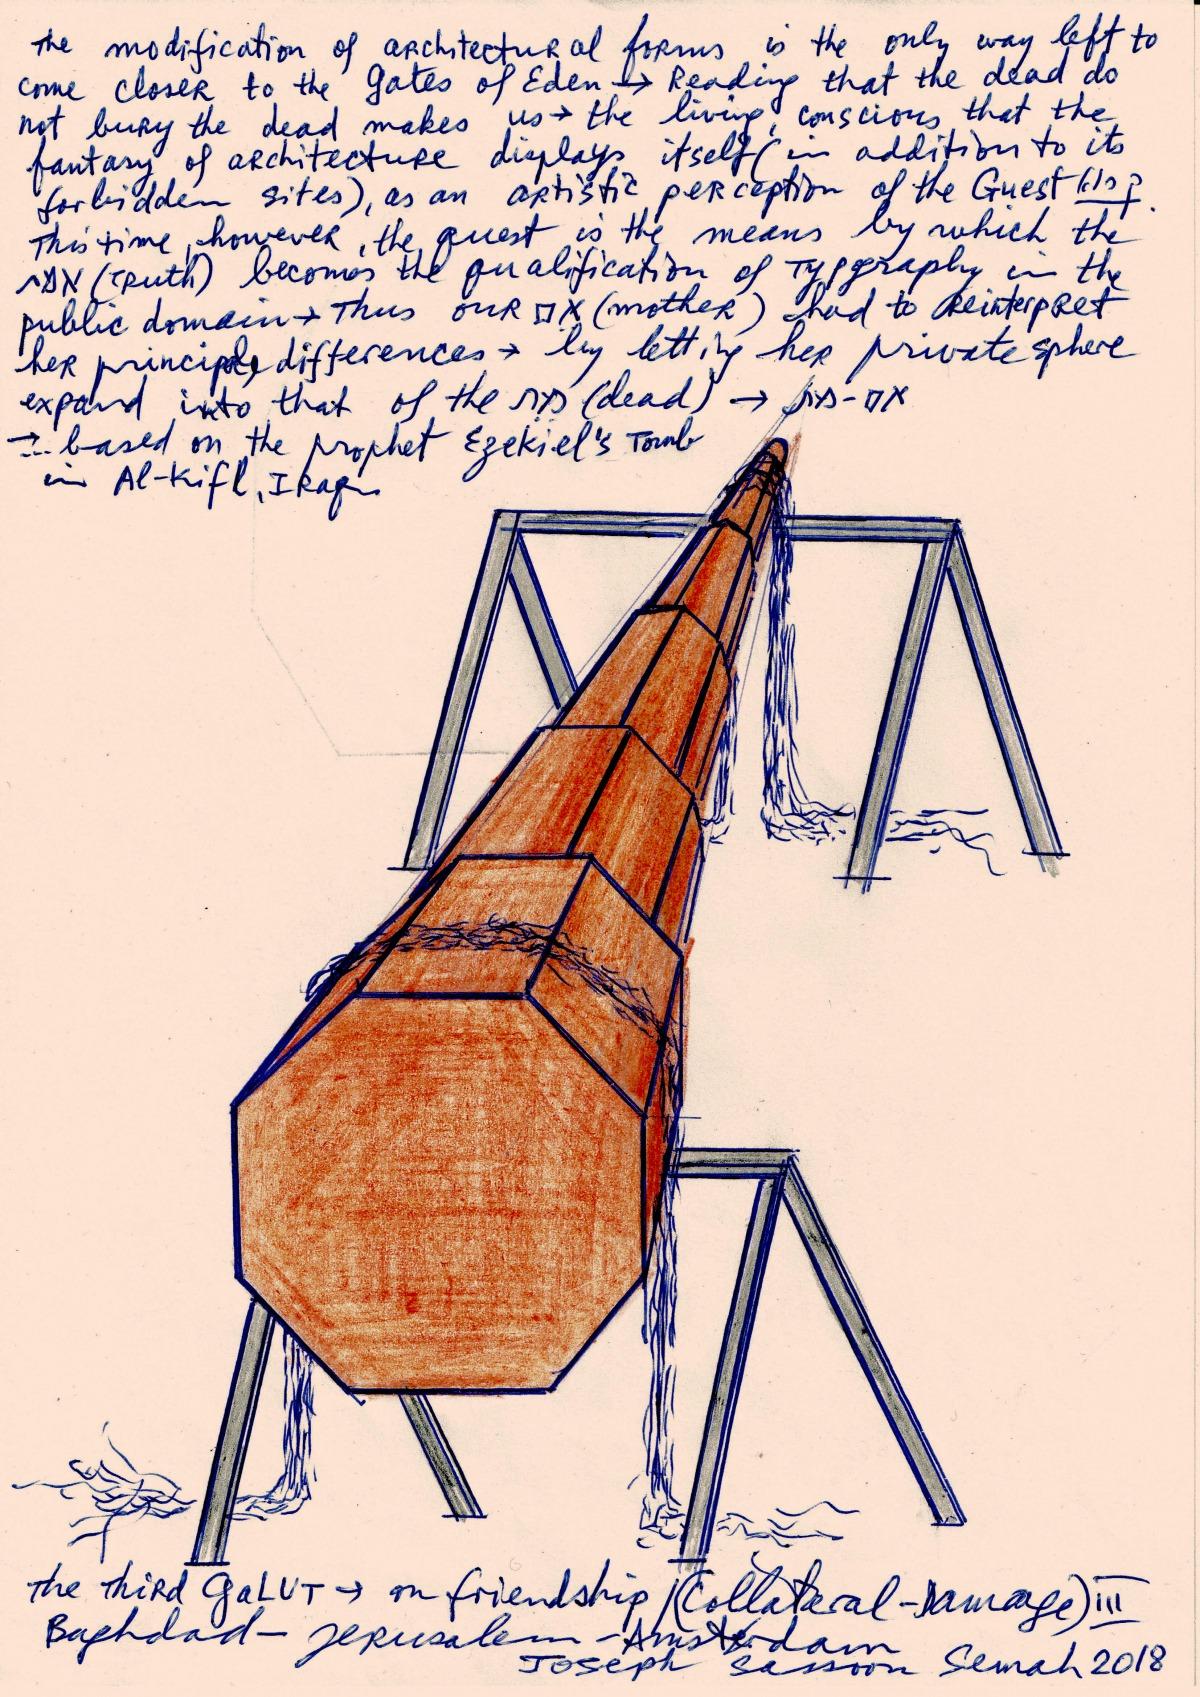 Drawing based on the Prophet Ezekiel's Tomb, in Al-Kifl, Iraq, On Friendship / (Collateral Damage) III  The Third GaLUT Baghdad, Jerusalem, Amsterdam  2018 42 x 30 cm, pen, pencil, paper